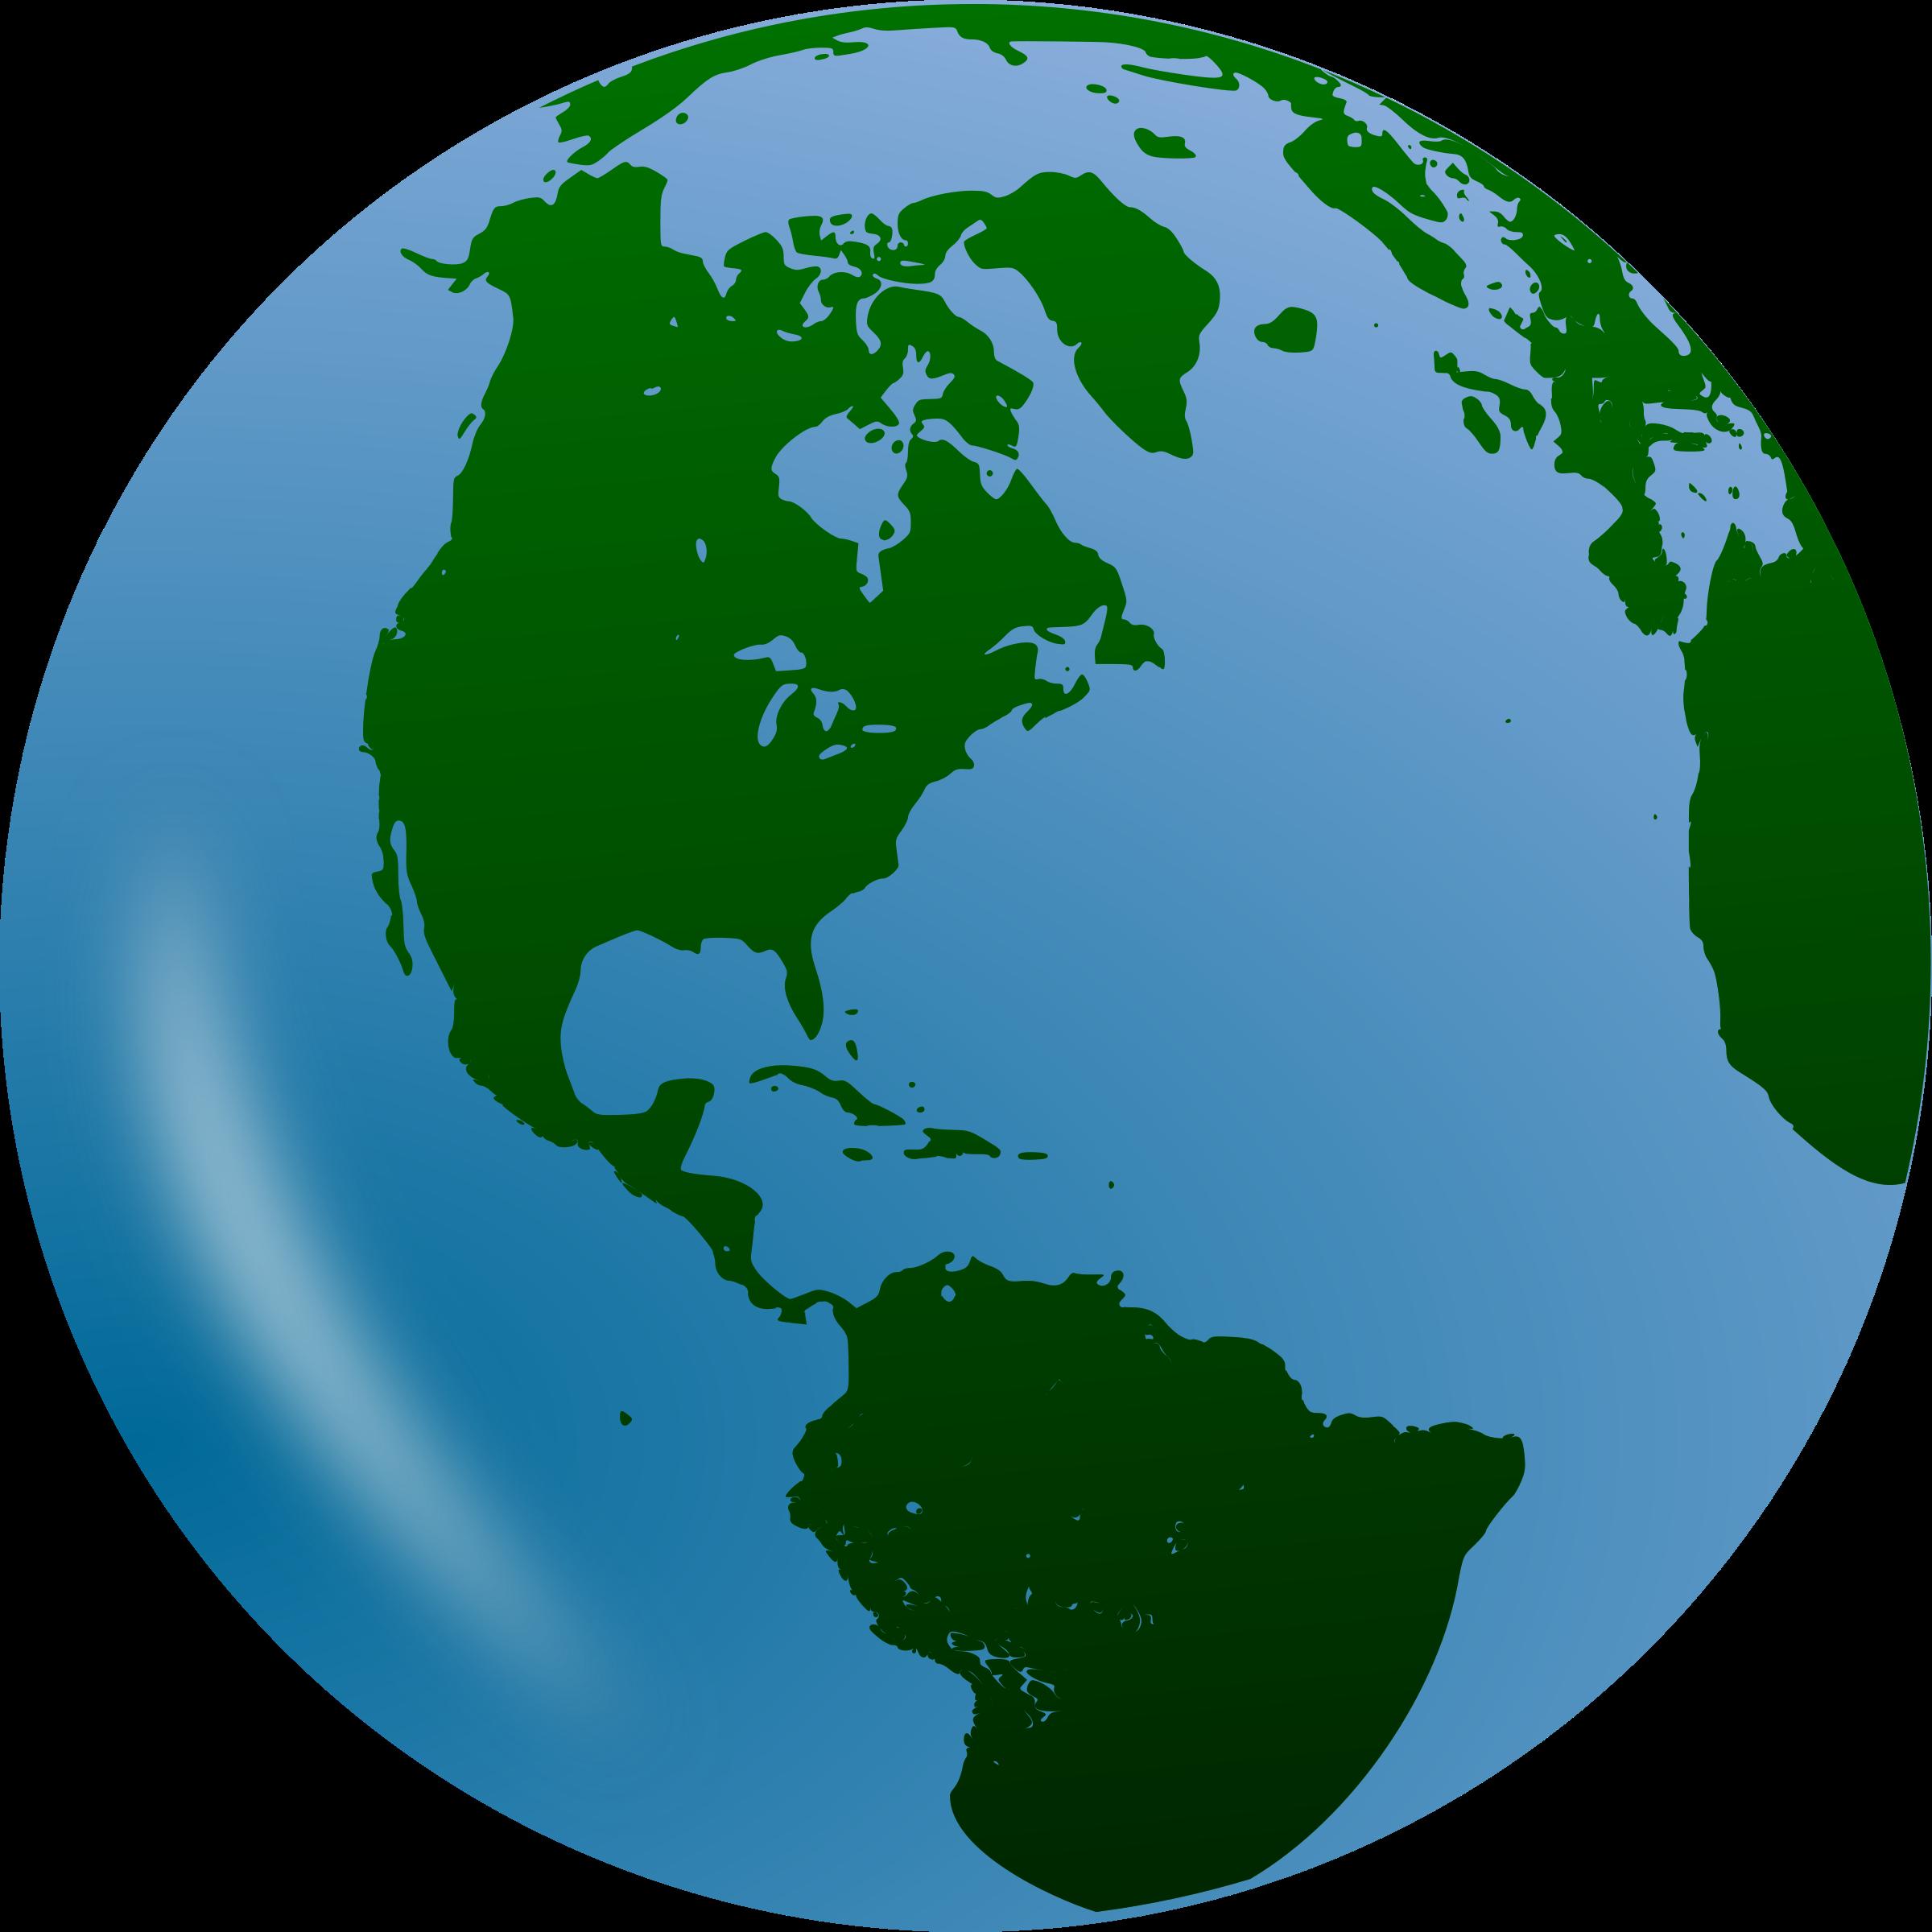 World clipart globe